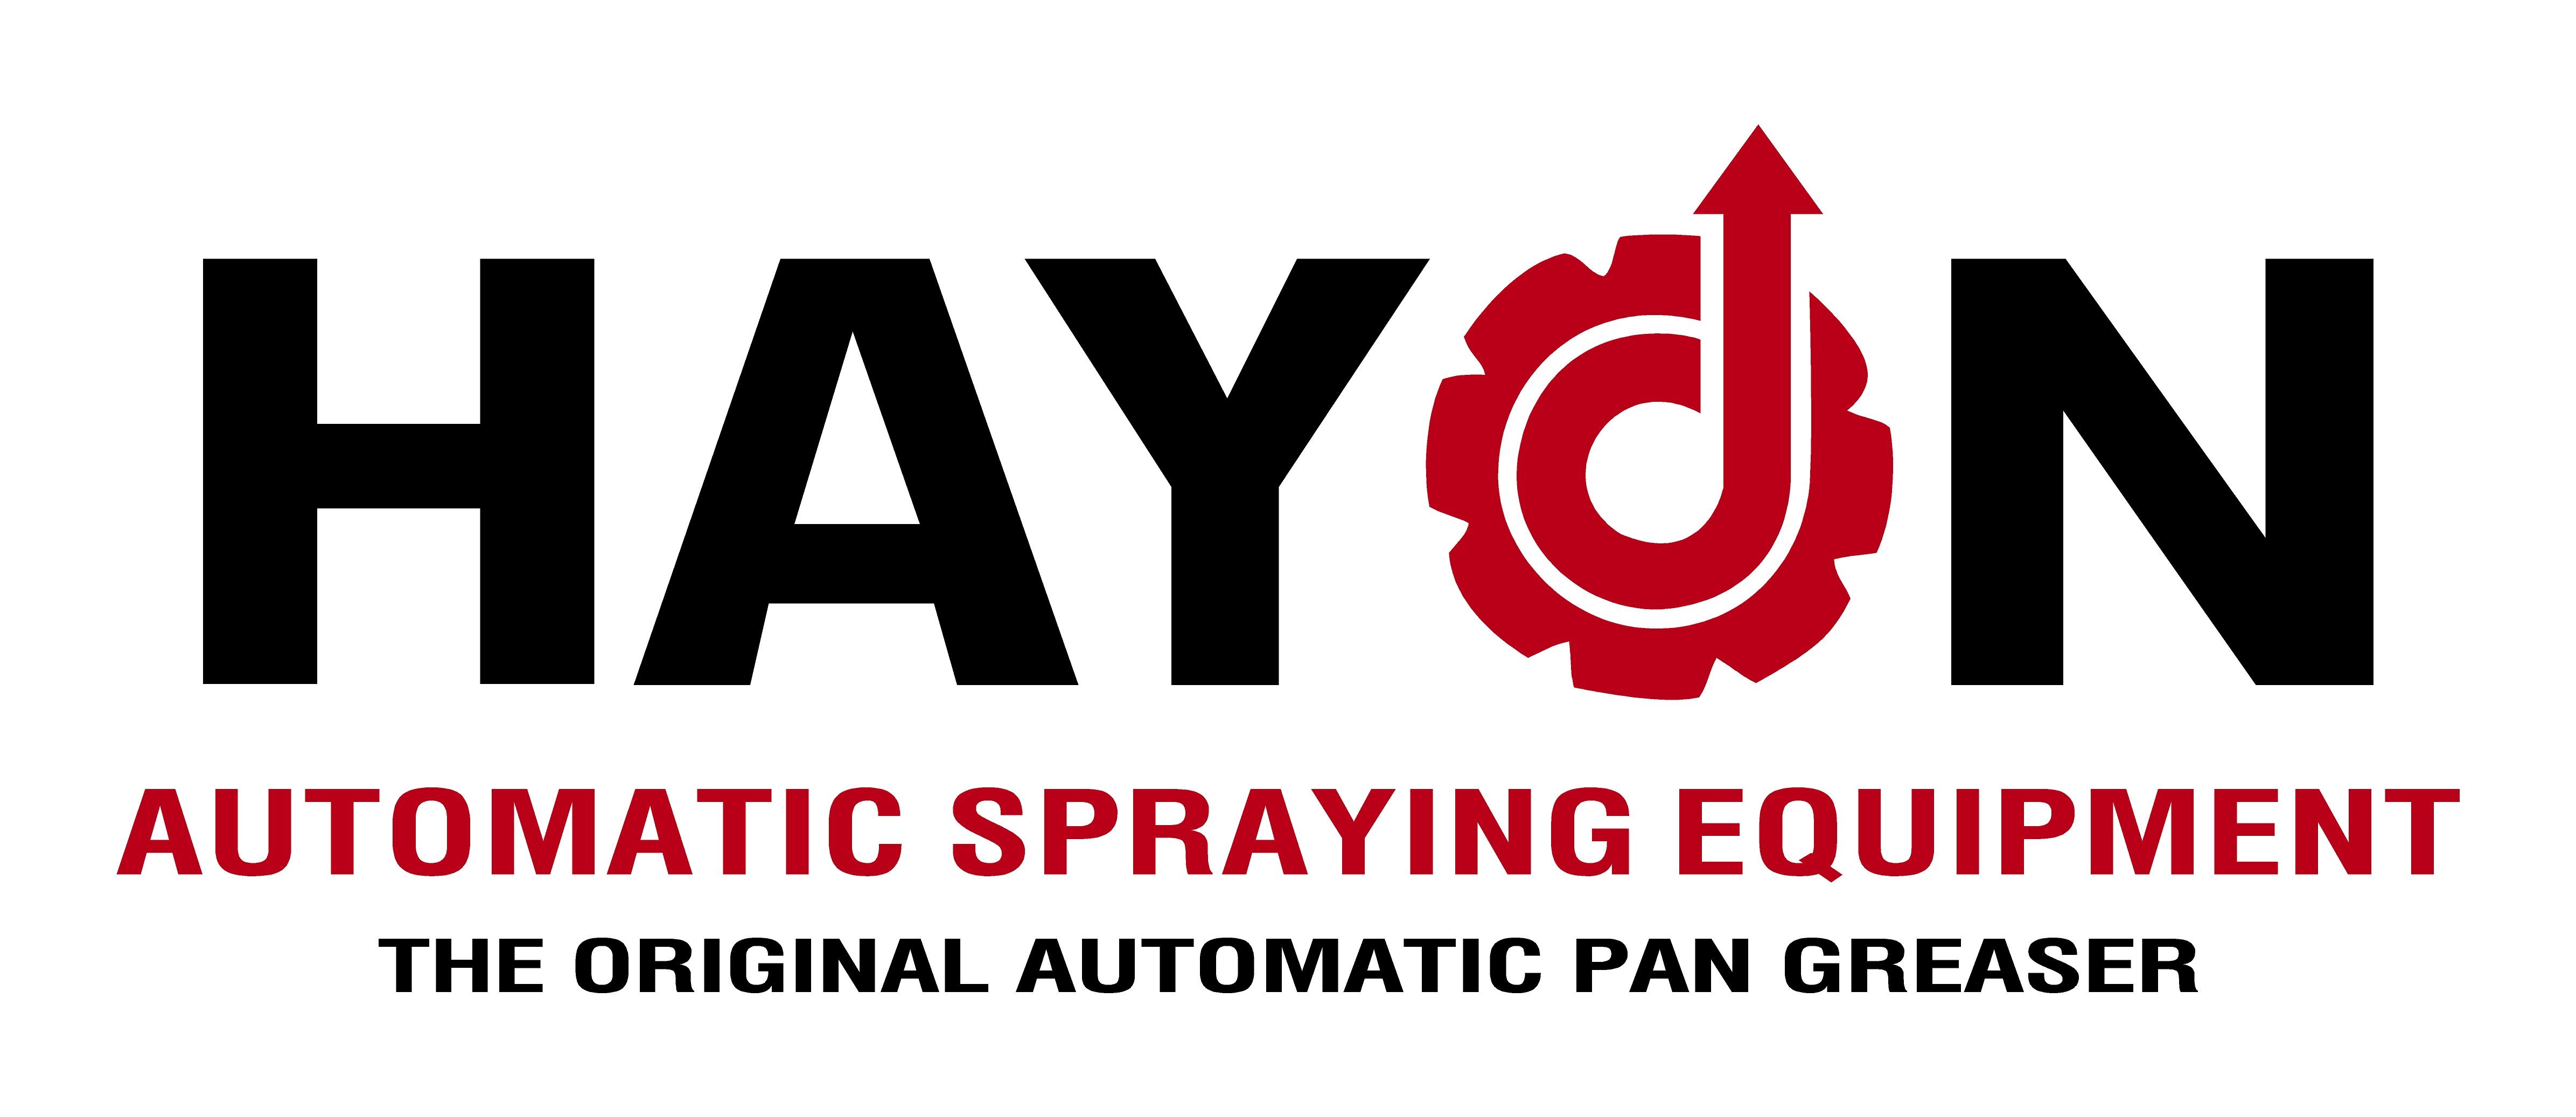 Hayon Automatic Spraying Equipment